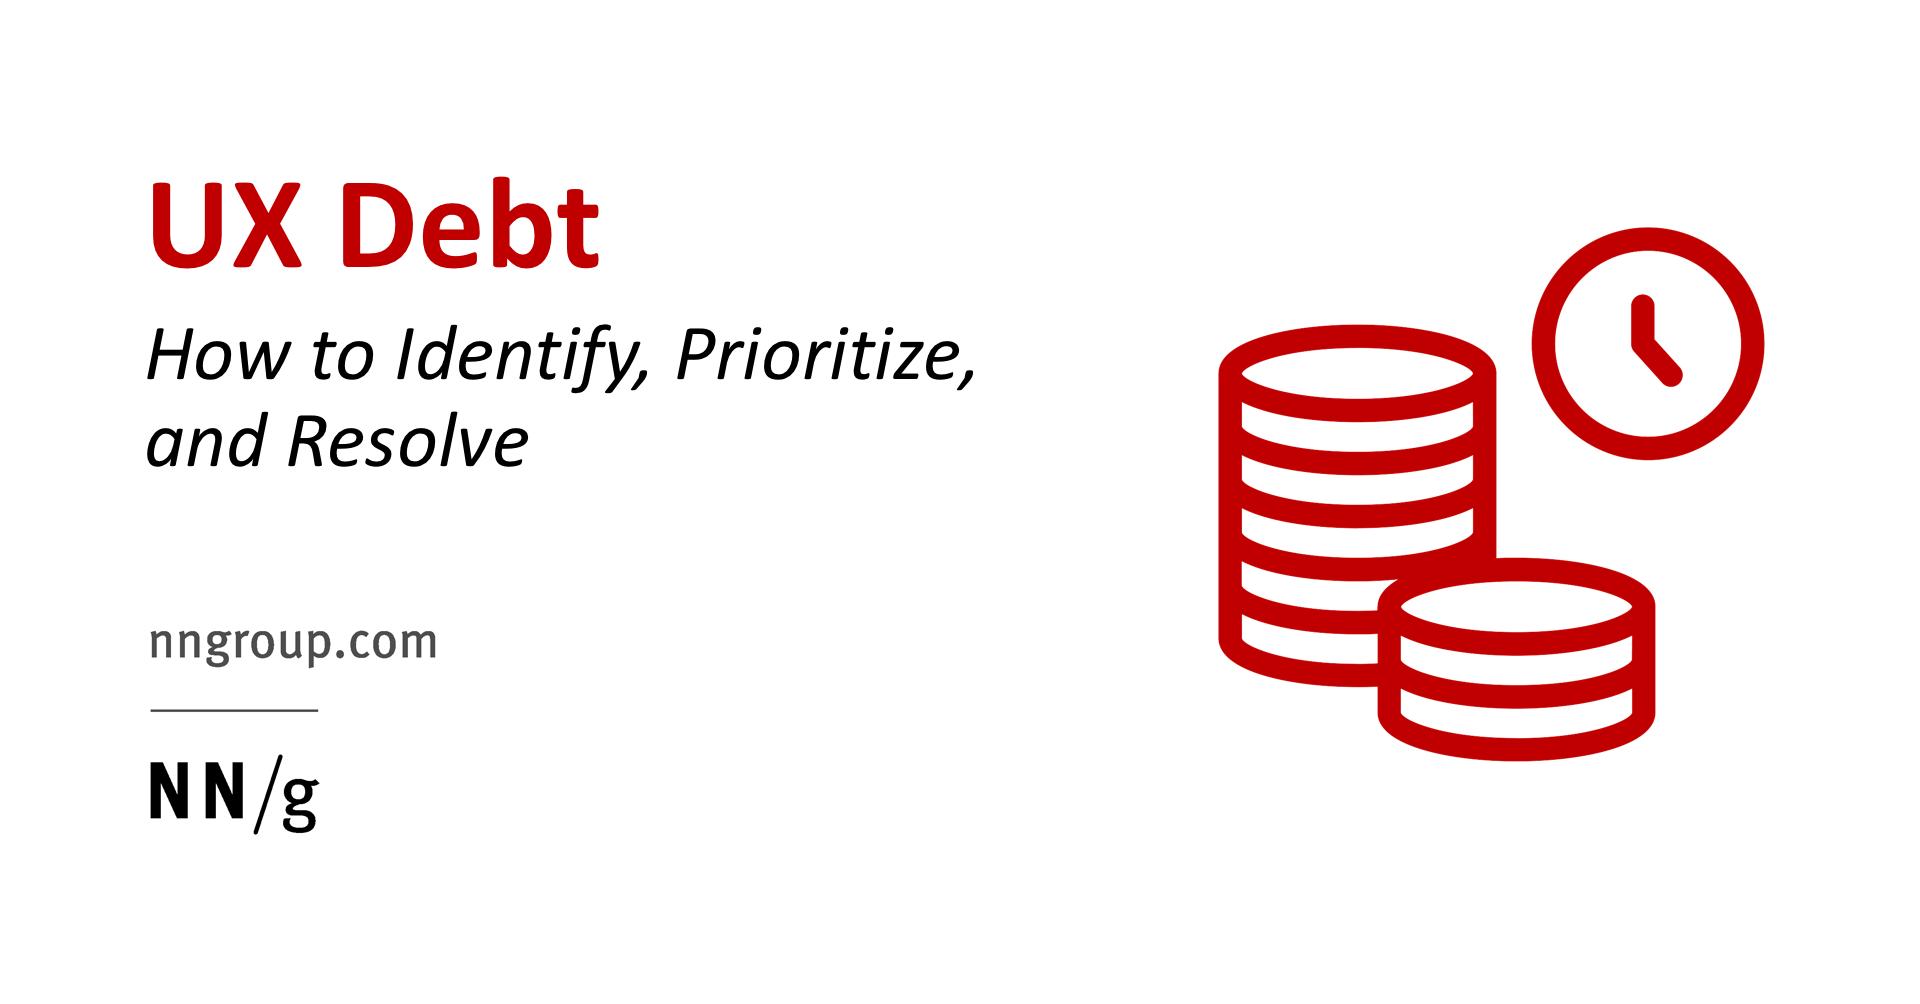 https://www.nngroup.com/articles/ux-debt/